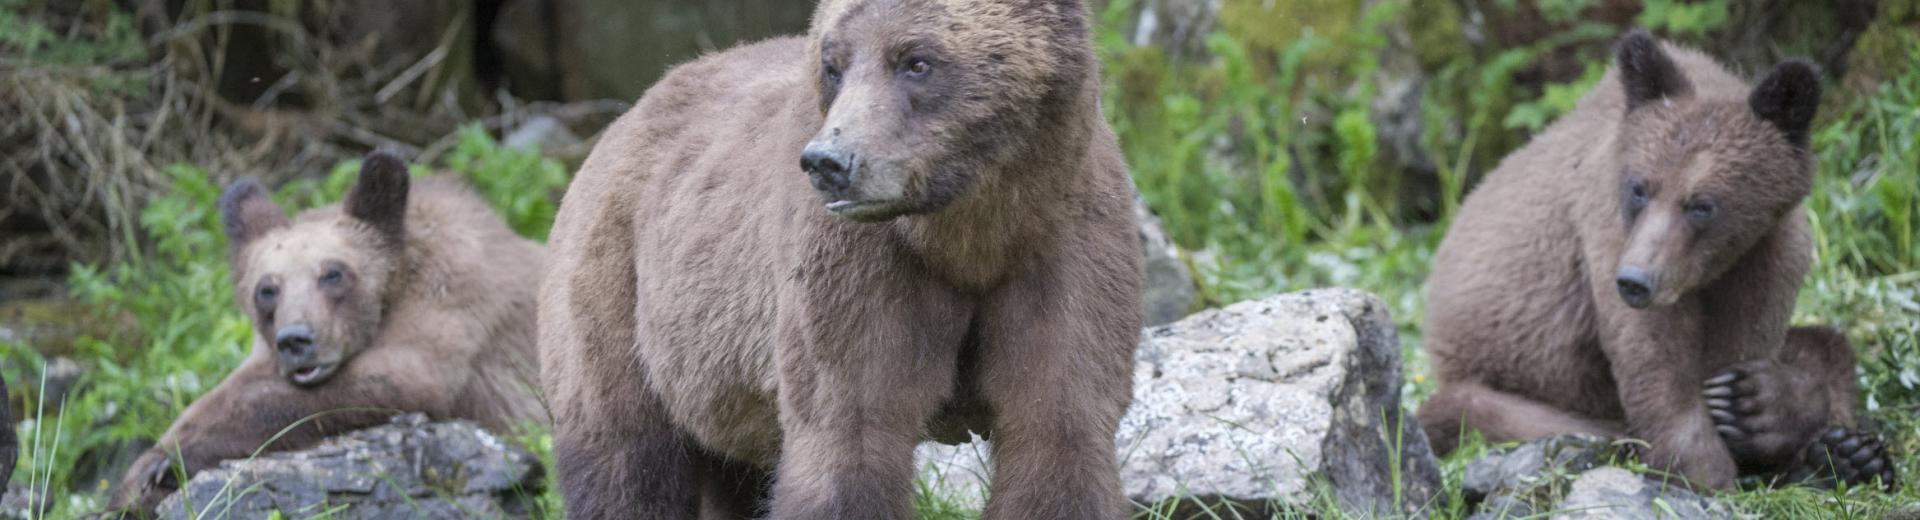 Grizzly Bear Family Khutzeymateen